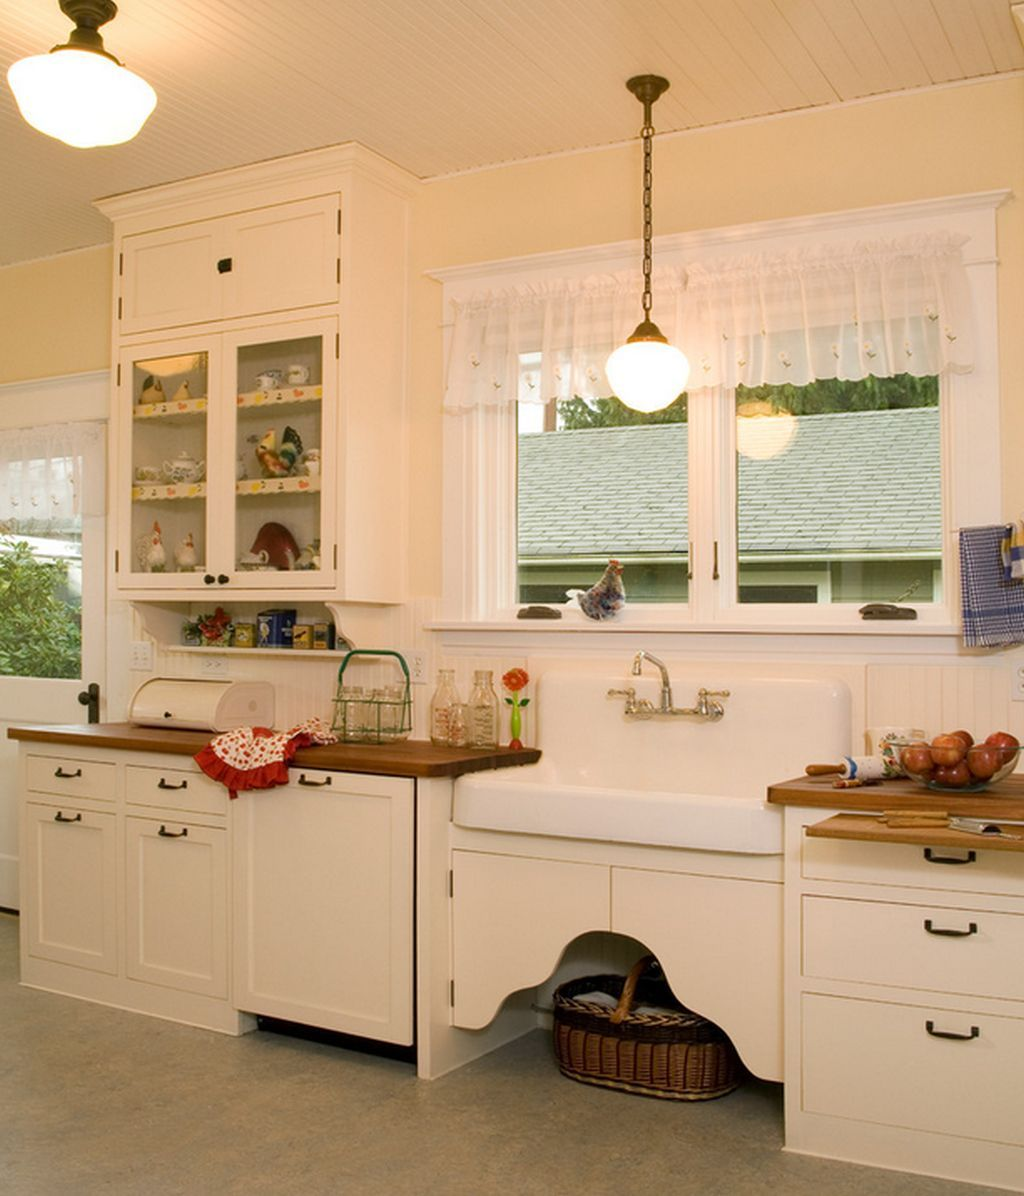 15 idei de perdele in bucatarie si sufragerie adela for Bathroom ideas 1920s home